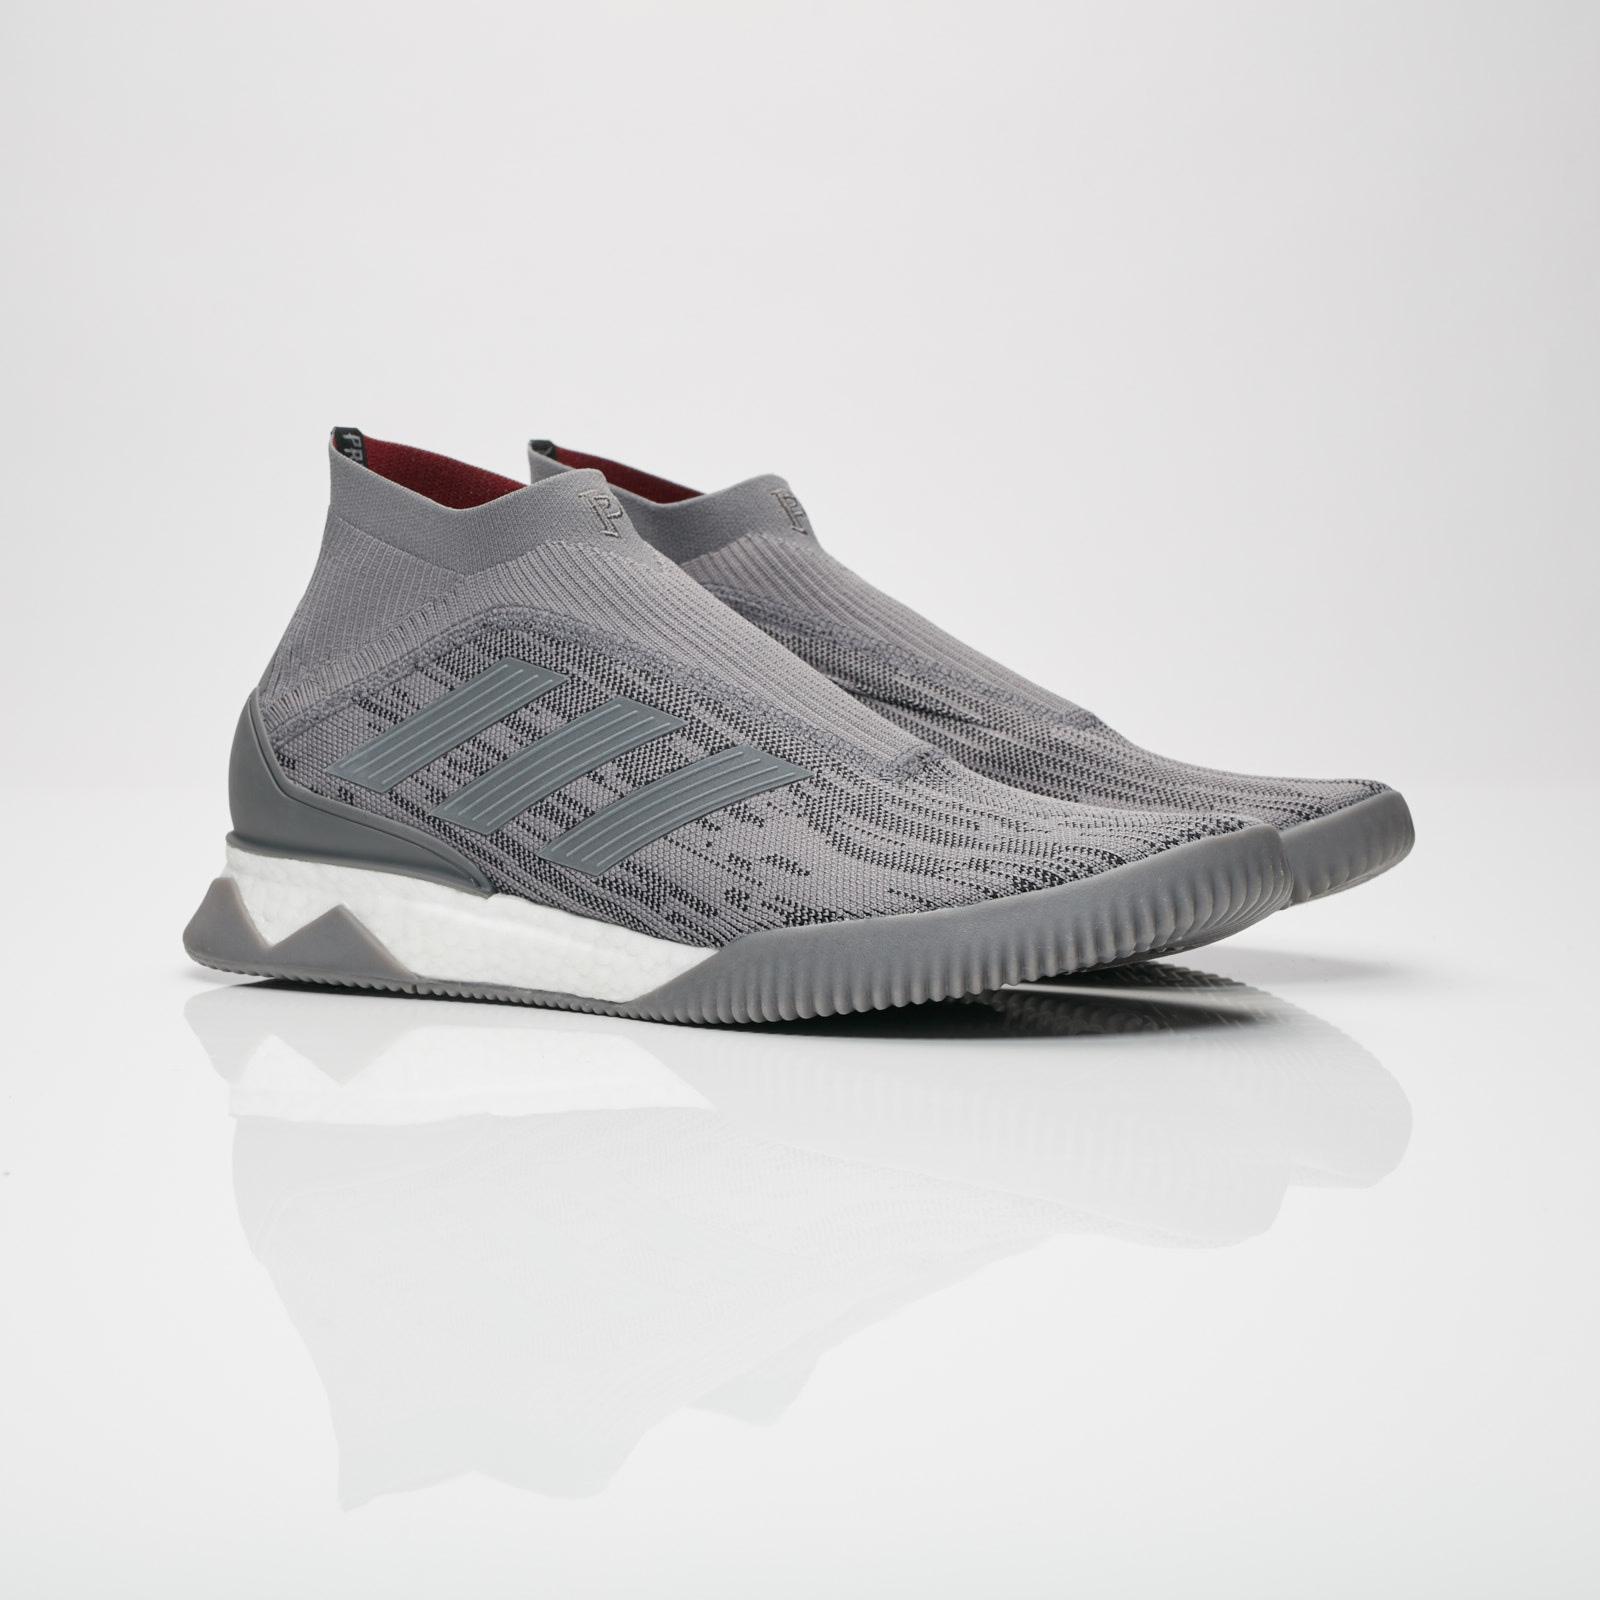 adidas Paul Pogba Predator 18+ TR - Ac7455 - Sneakersnstuff ...